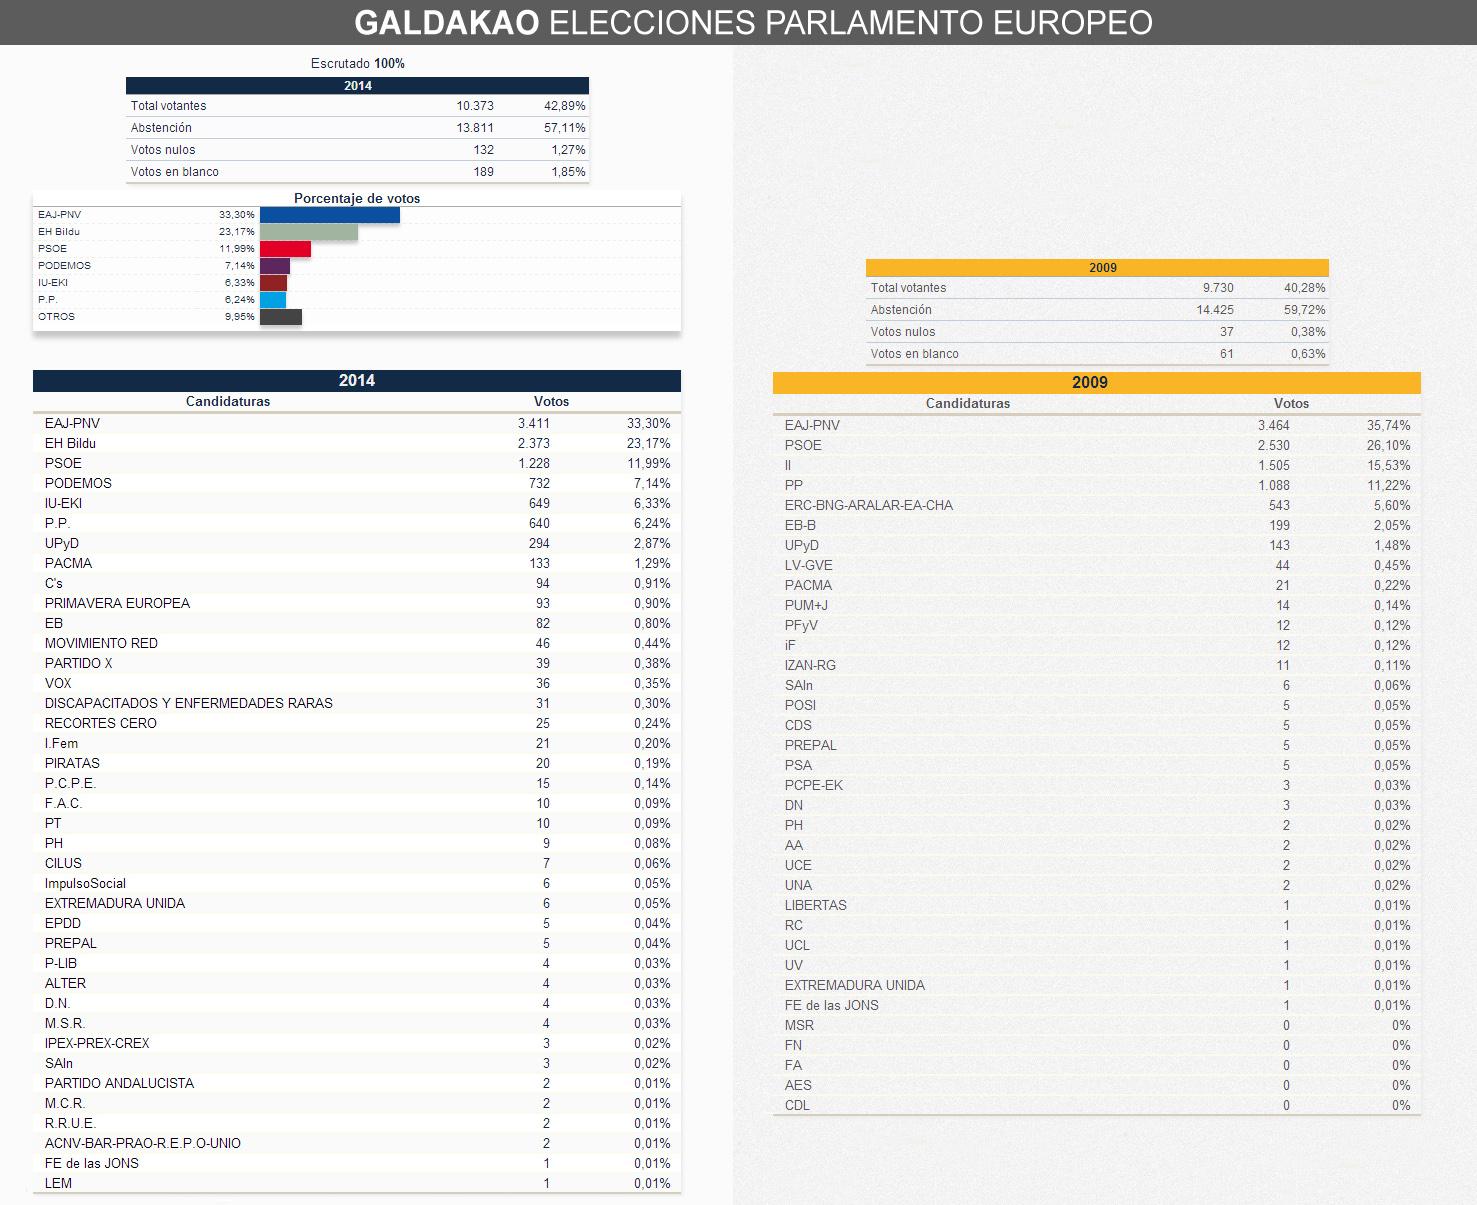 elecciones_europeas_2014_galdakao_comparativa